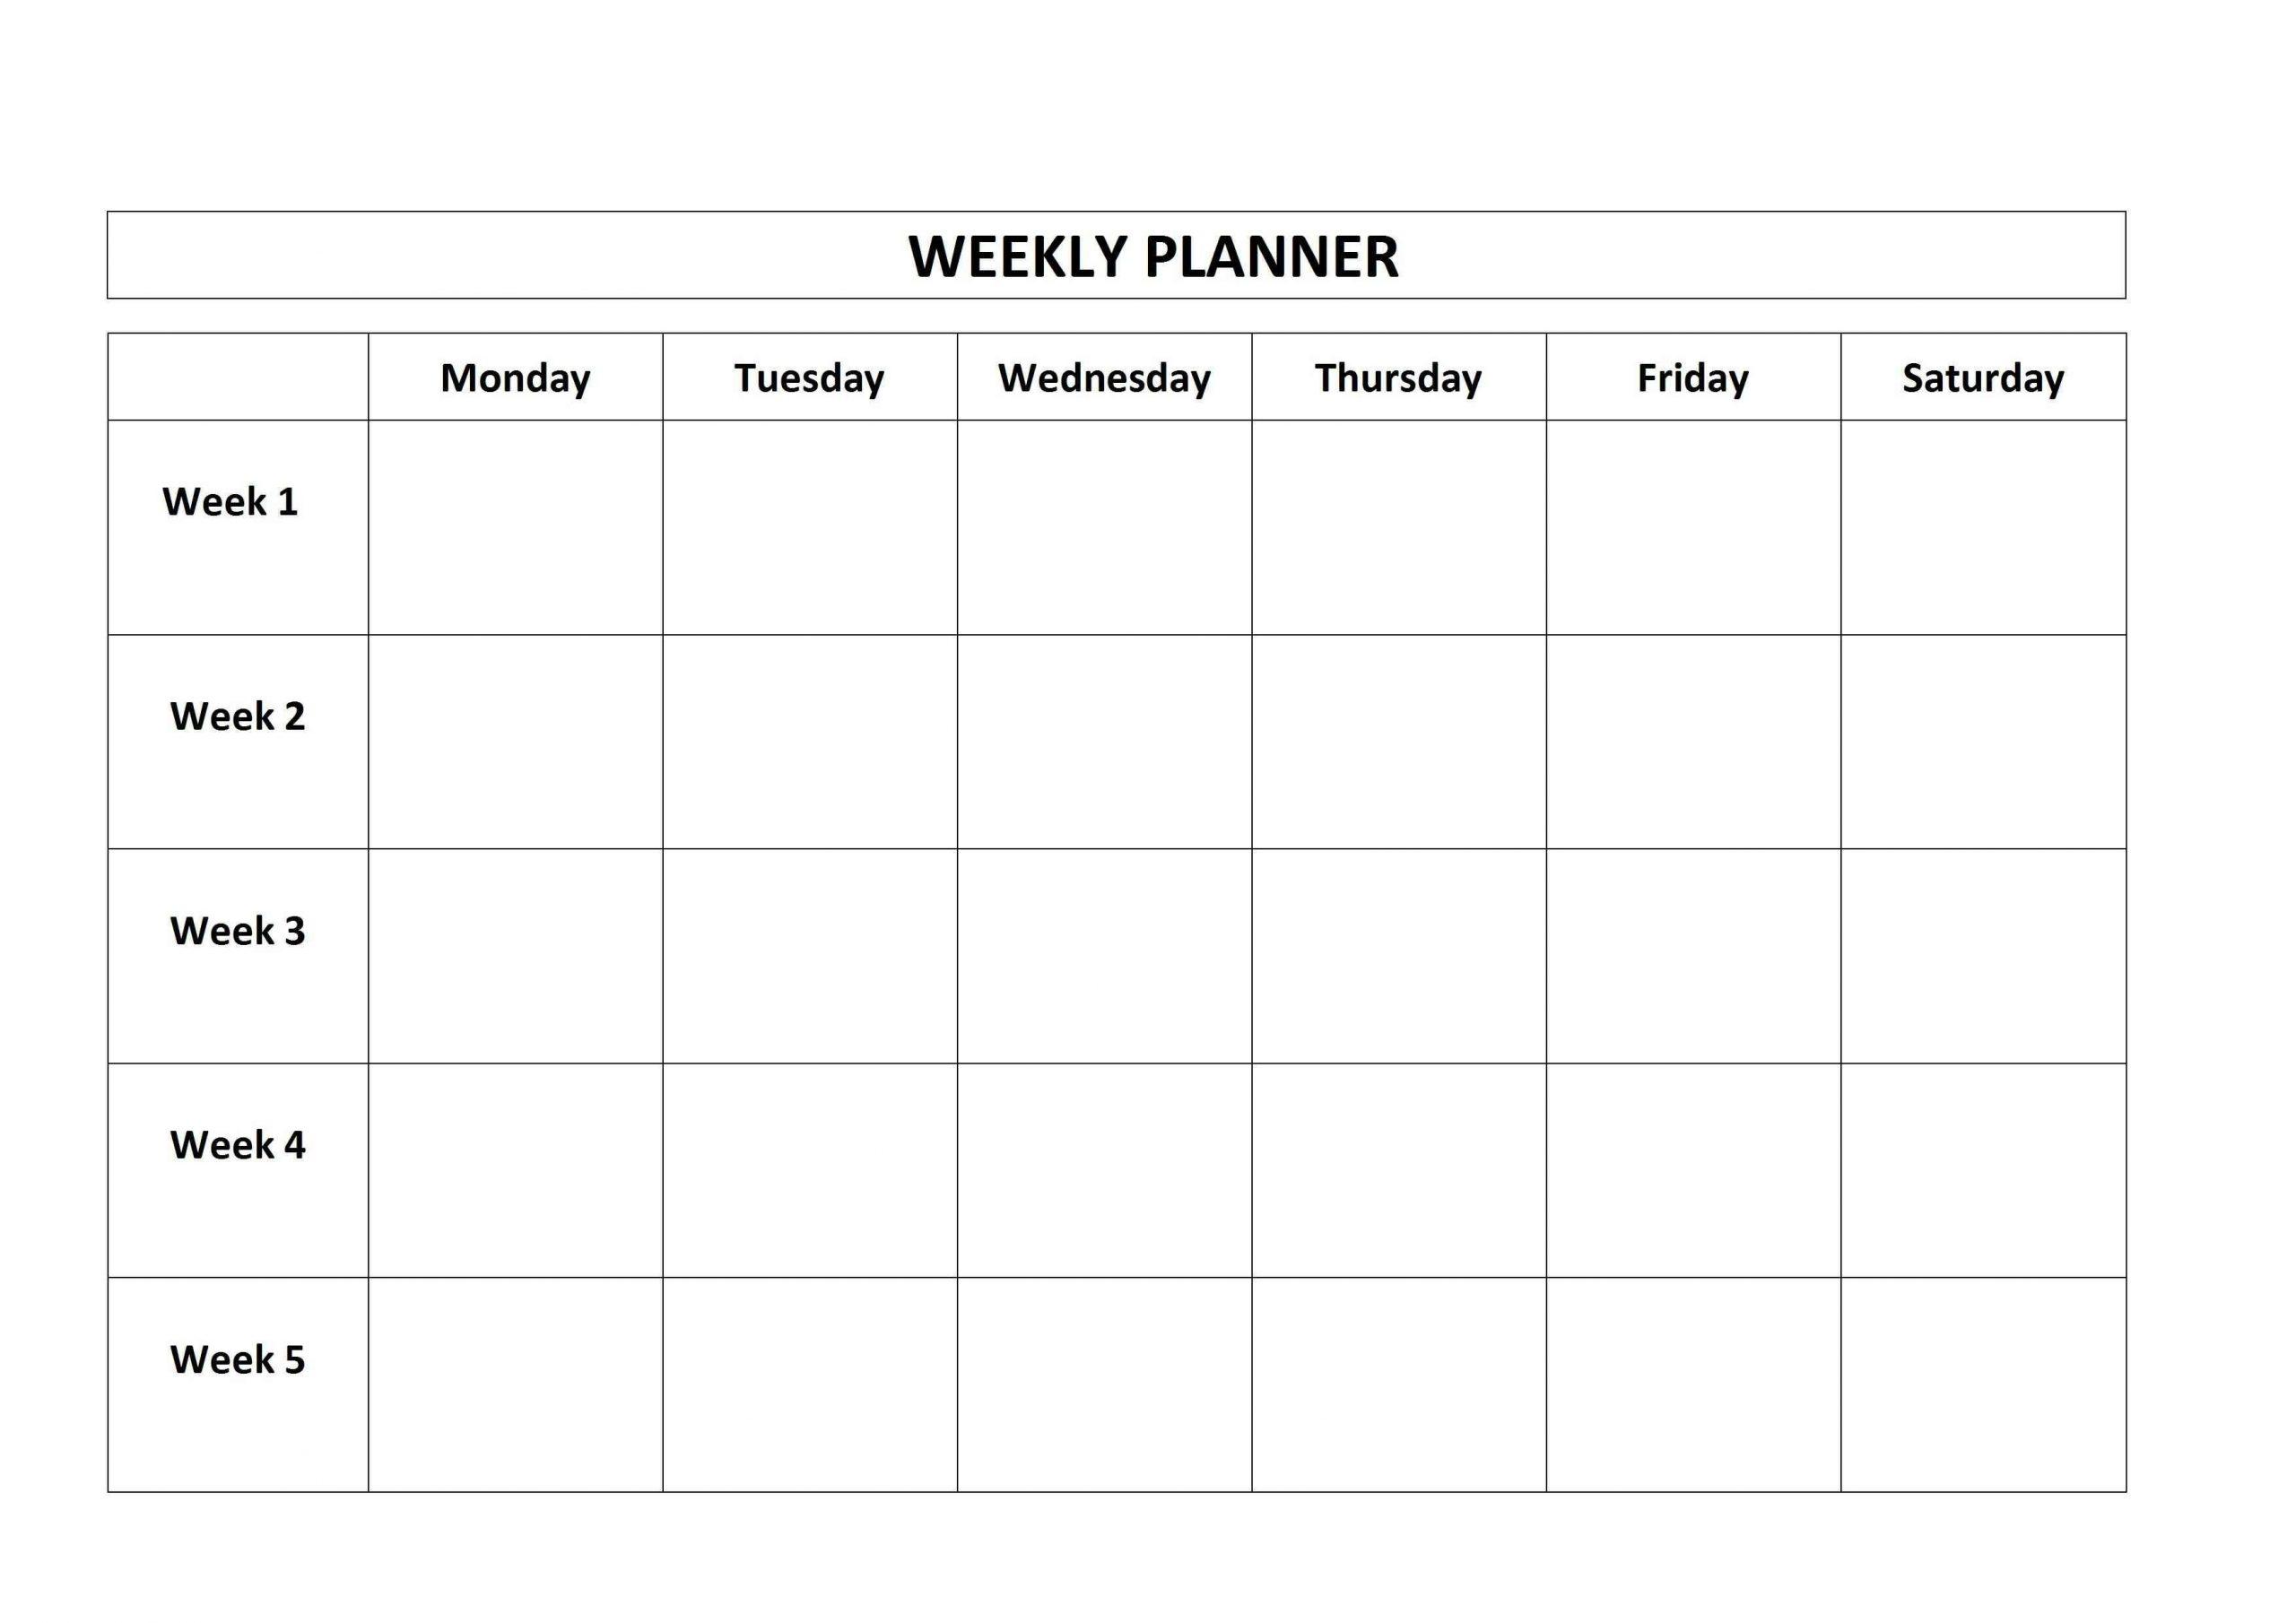 5 Day Calendar Template - Vaydile.euforic.co-Blank Blank Free Printable Monday Through Friday